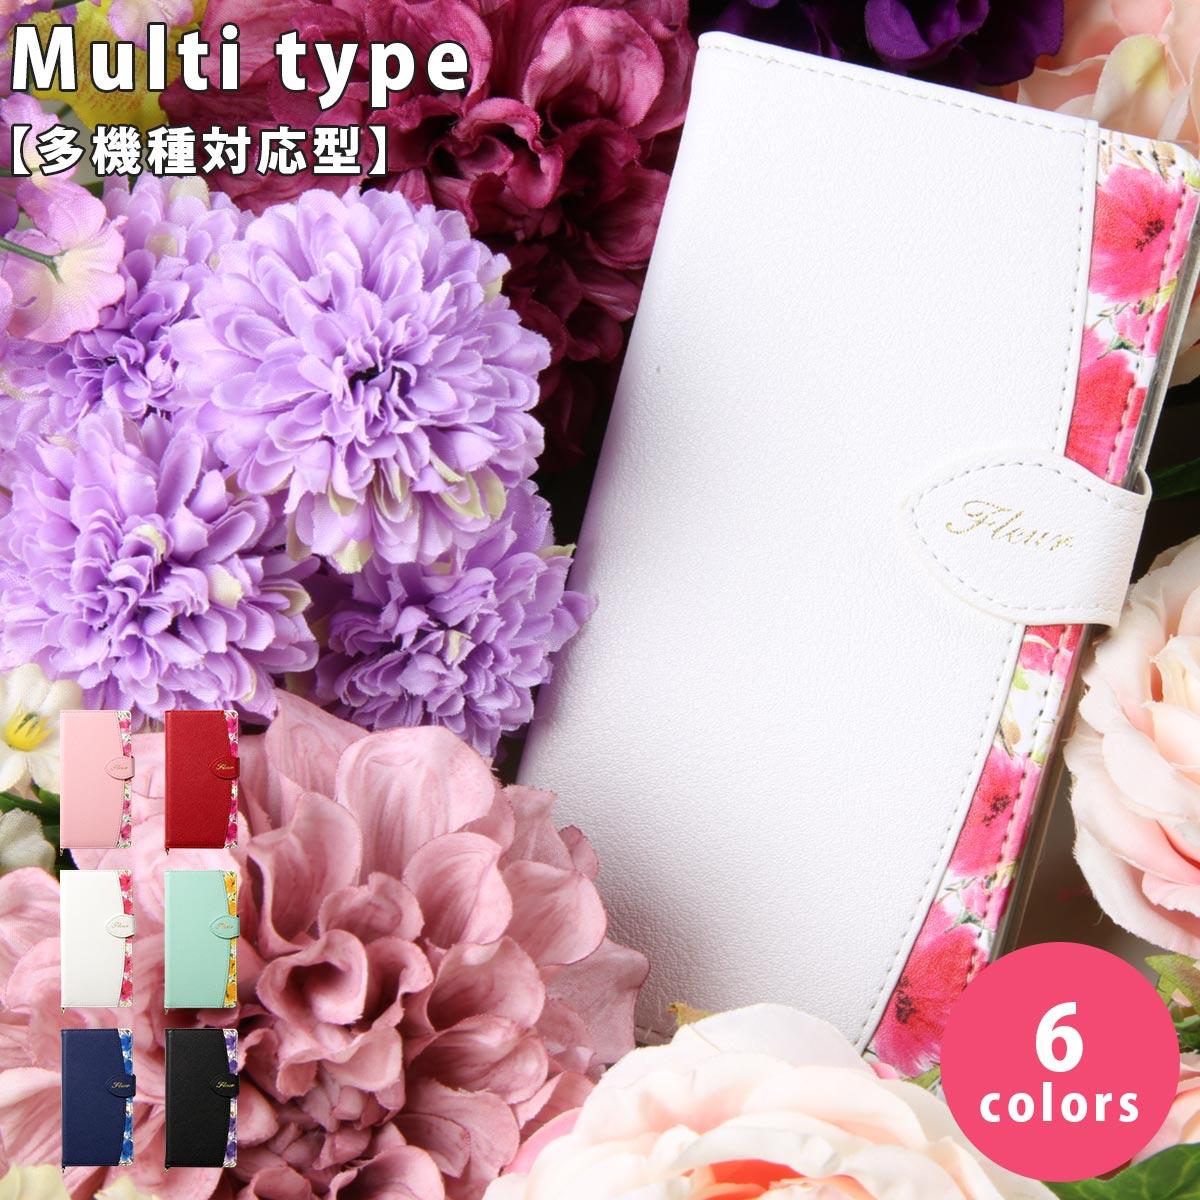 NATURAL design Fleur iPhone X iPhone 8 スマホケース 手帳型 全機種対応 ベルトなし スマホカバー XPERIA AQUOS iPhone7 スマートフォン アイフォン ナチュラルデザイン